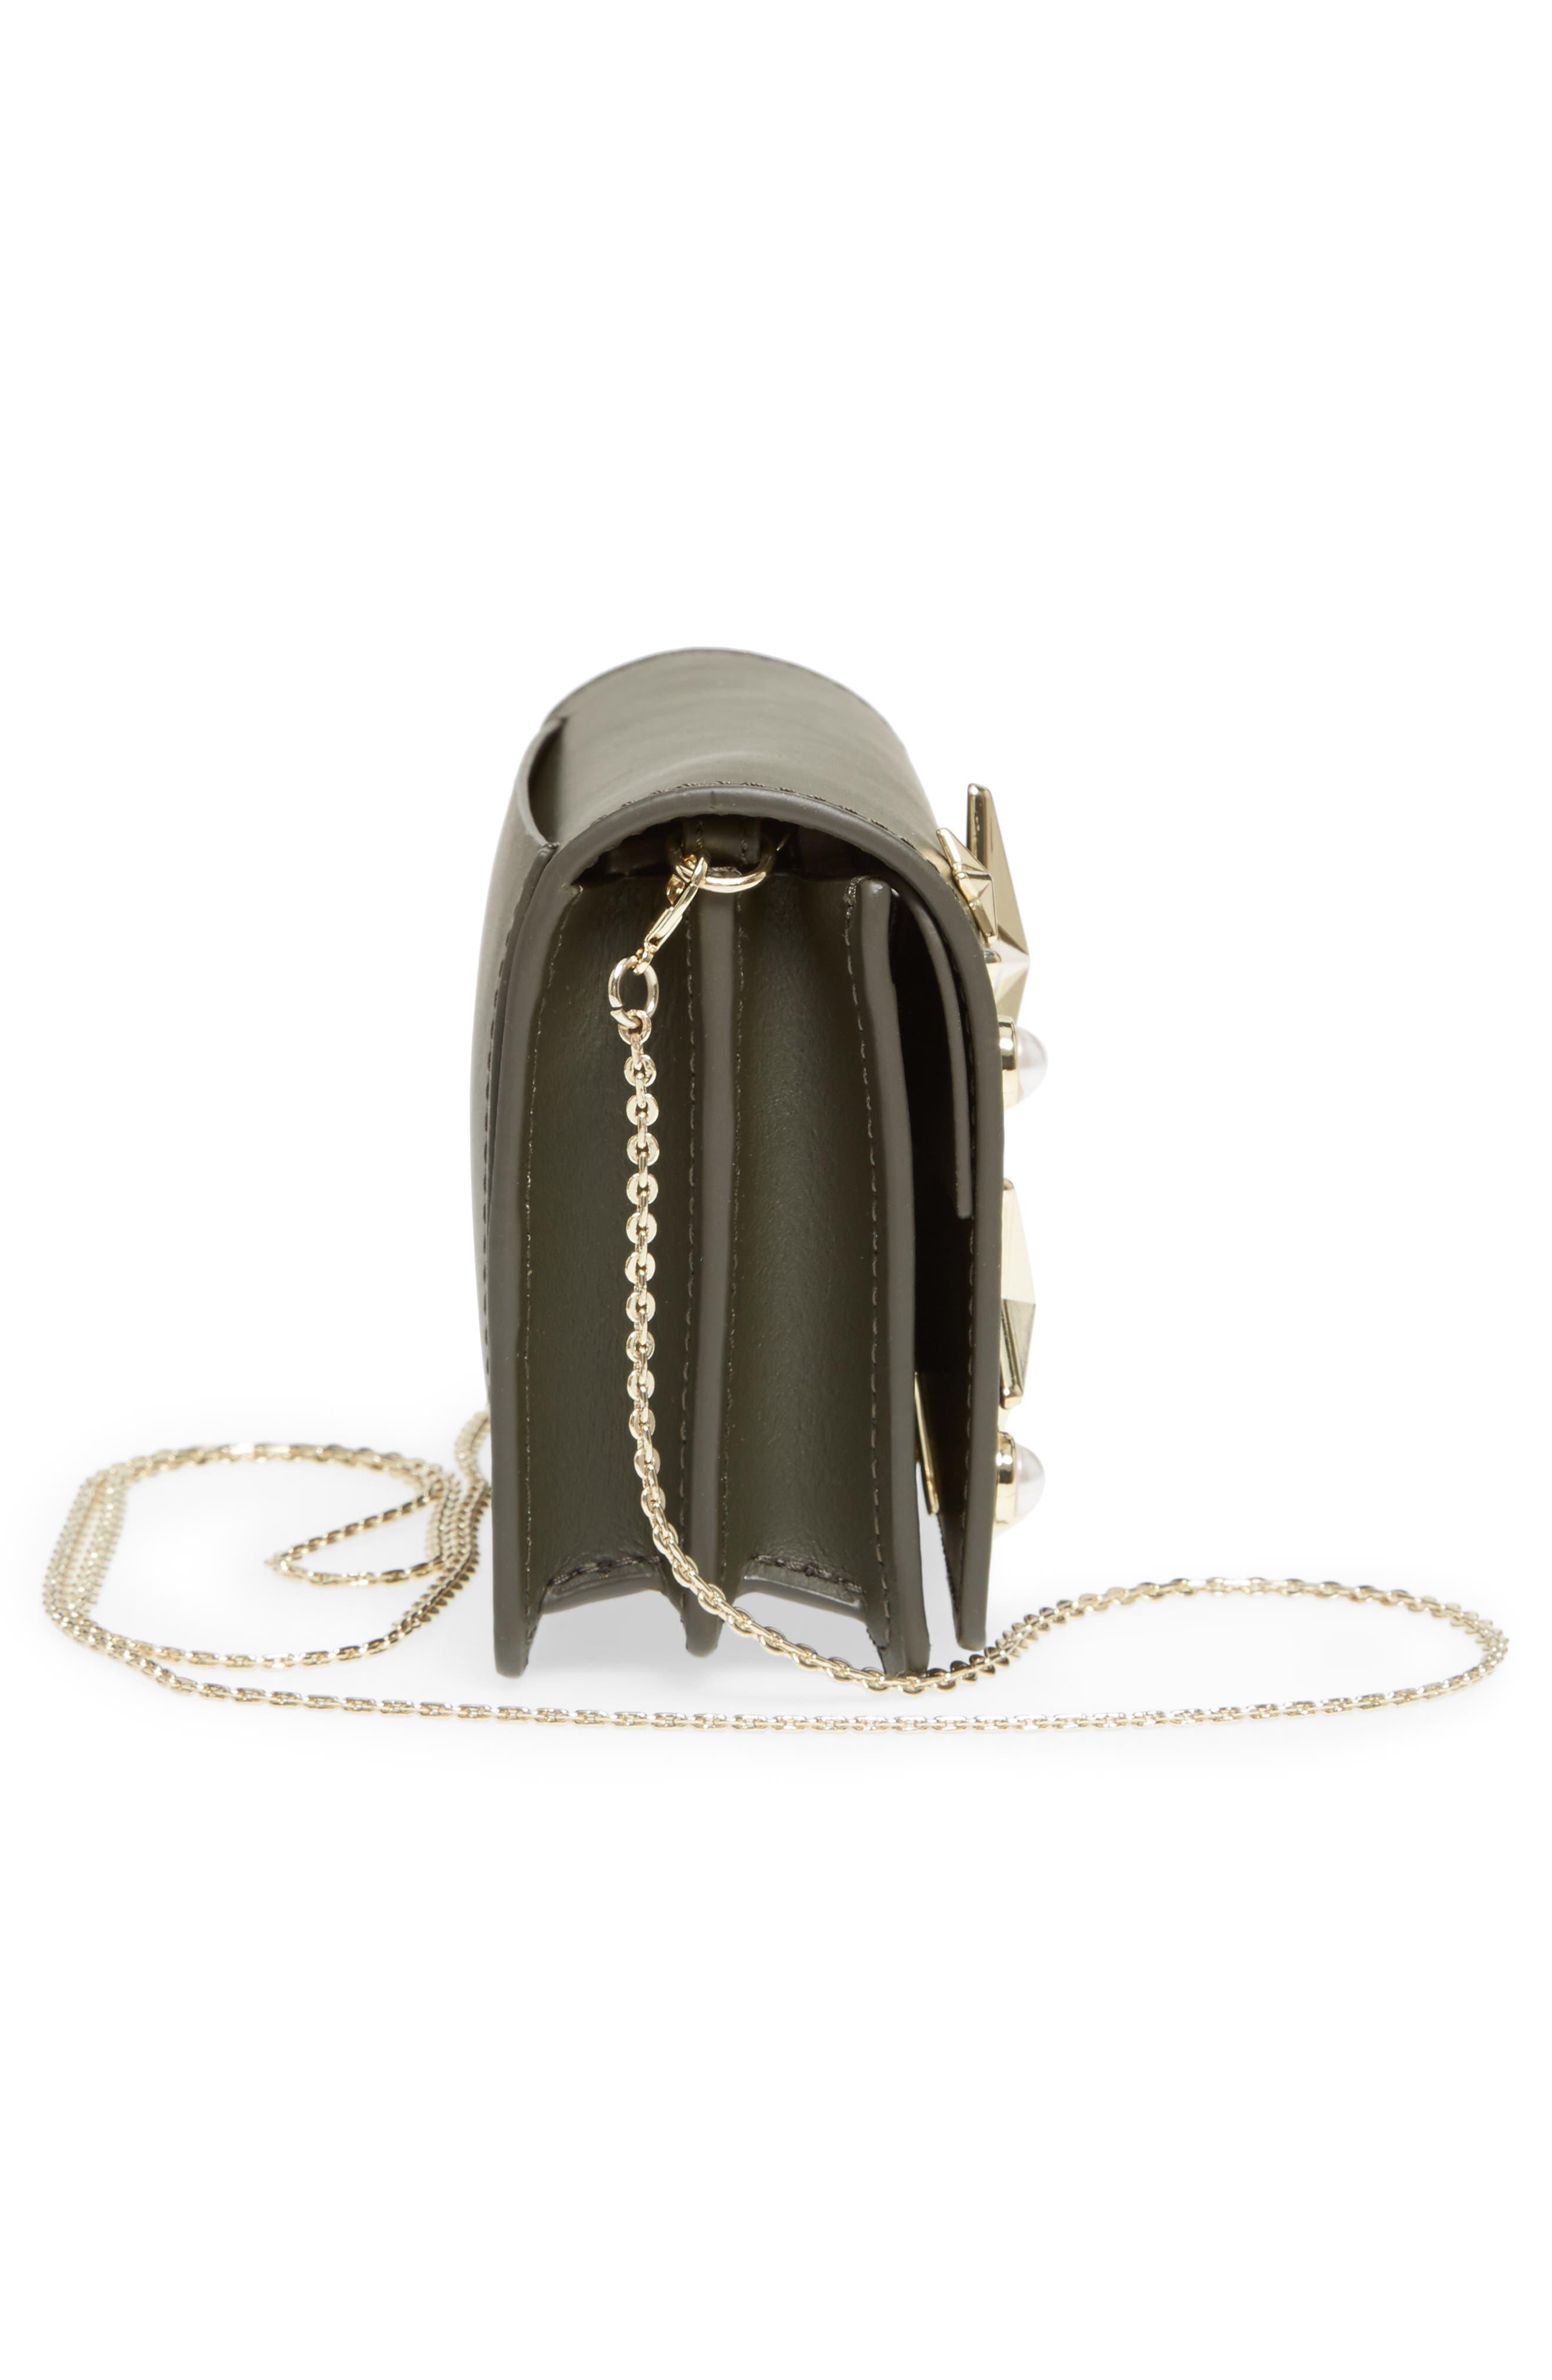 ZAC Zac Posen Earthette Leather Accordion Bag,                             Alternate thumbnail 5, color,                             300